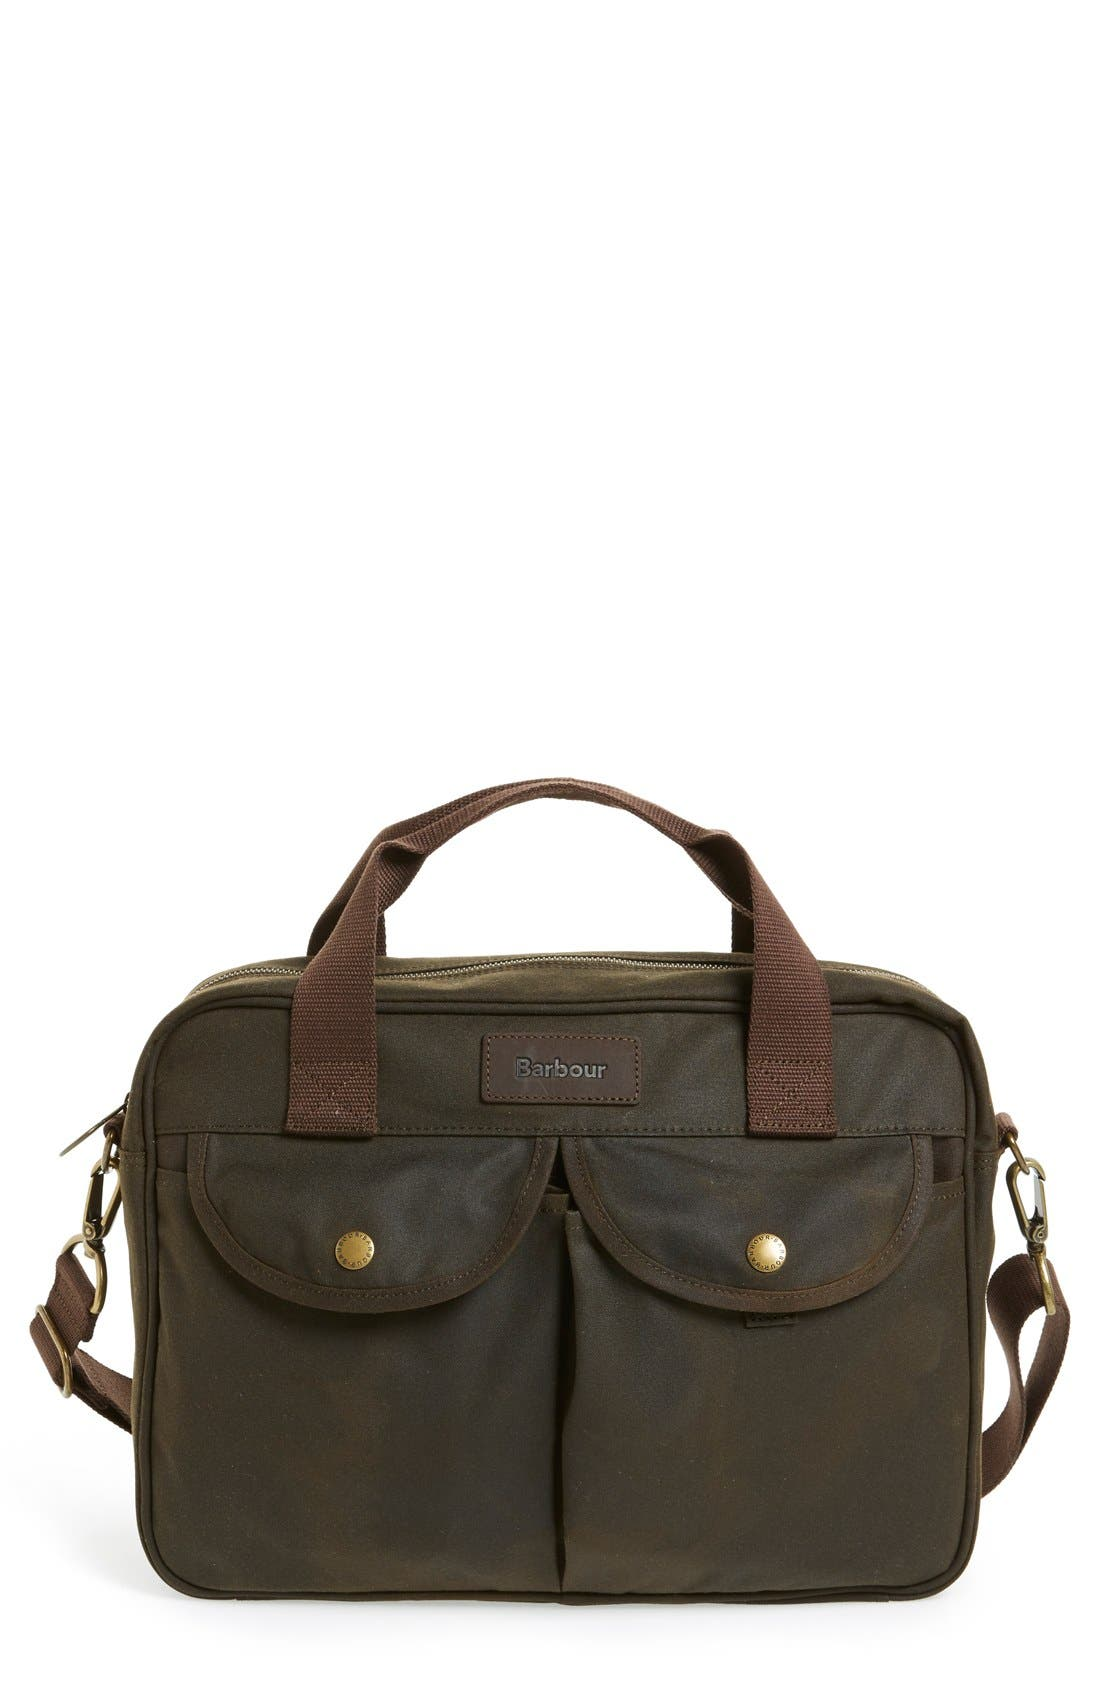 'Longthorpe' Waxed Canvas Laptop Bag,                             Main thumbnail 1, color,                             Olive